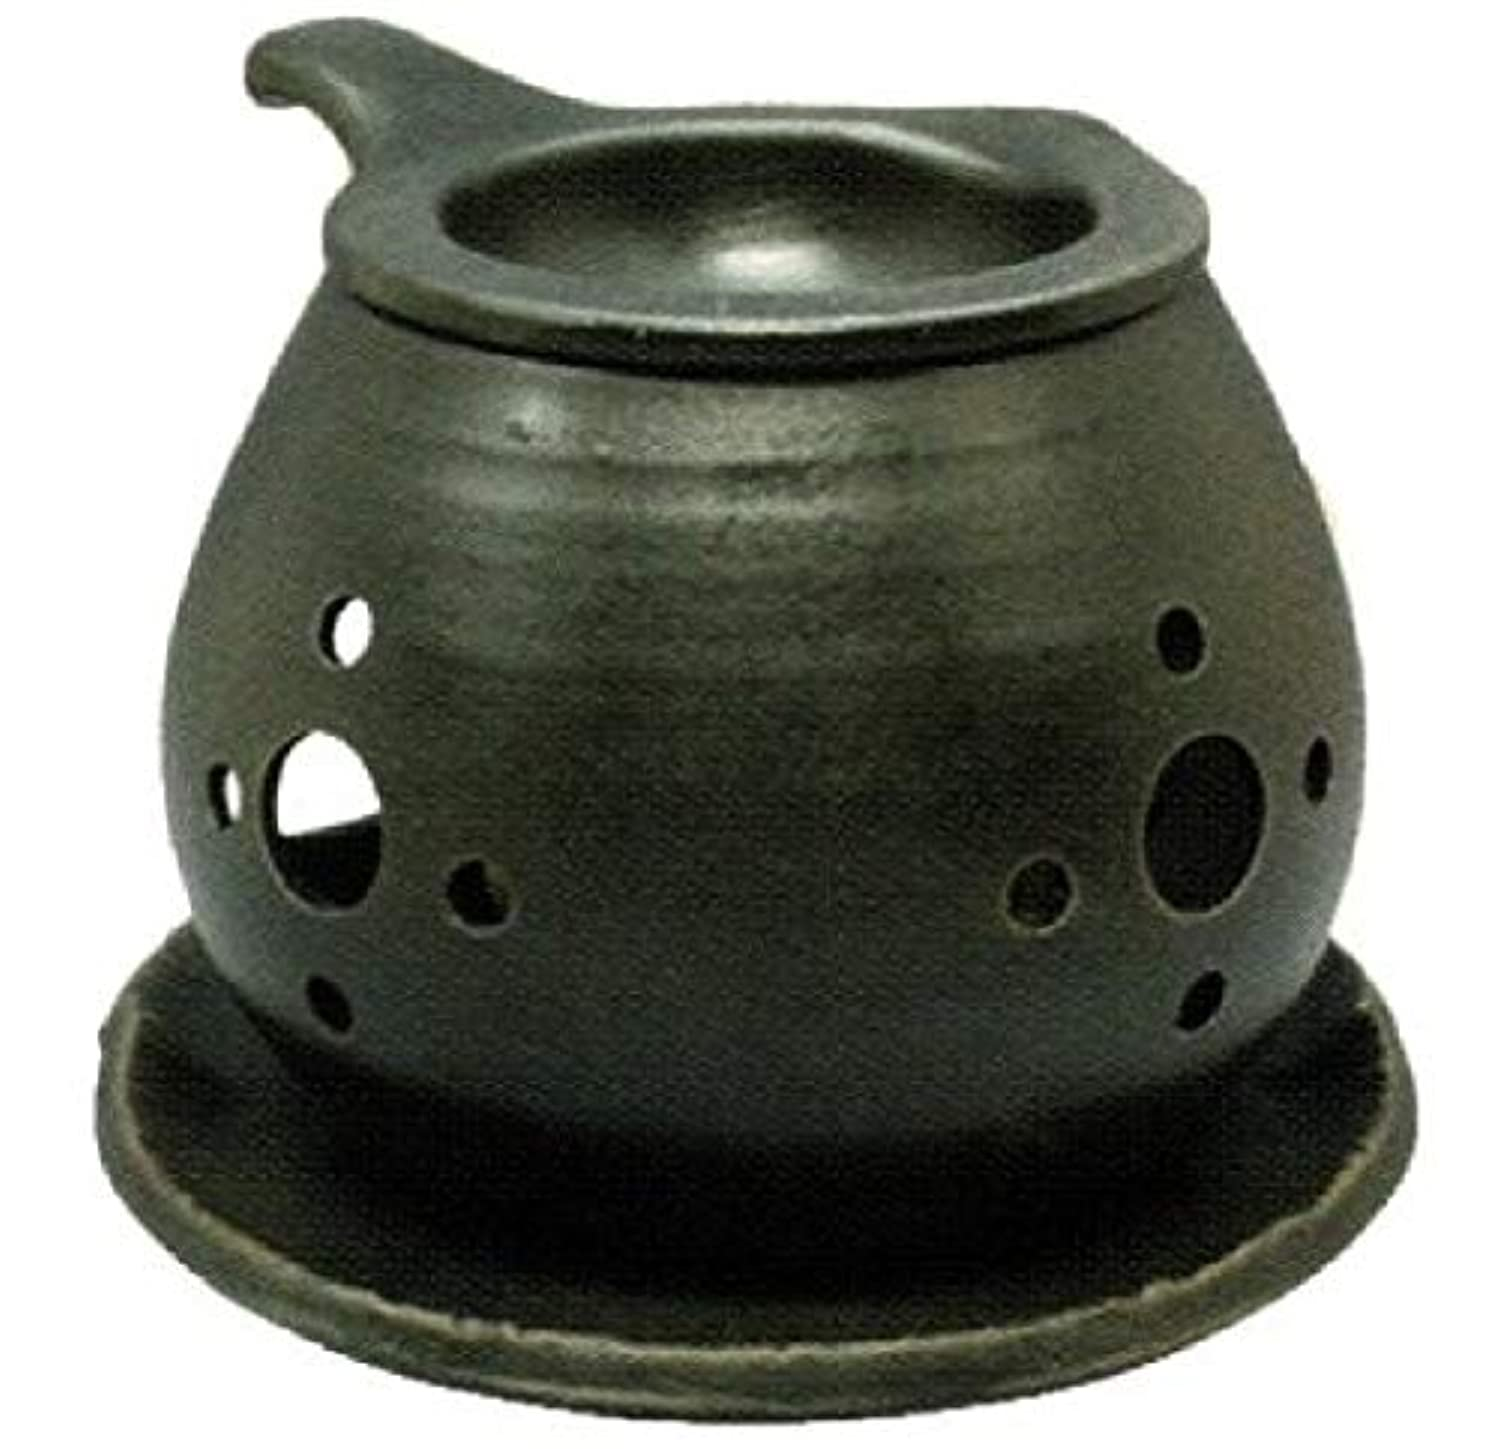 予測堂々たる匿名常滑焼 ?40-03 茶香炉間宮窯  皿付    径14×10